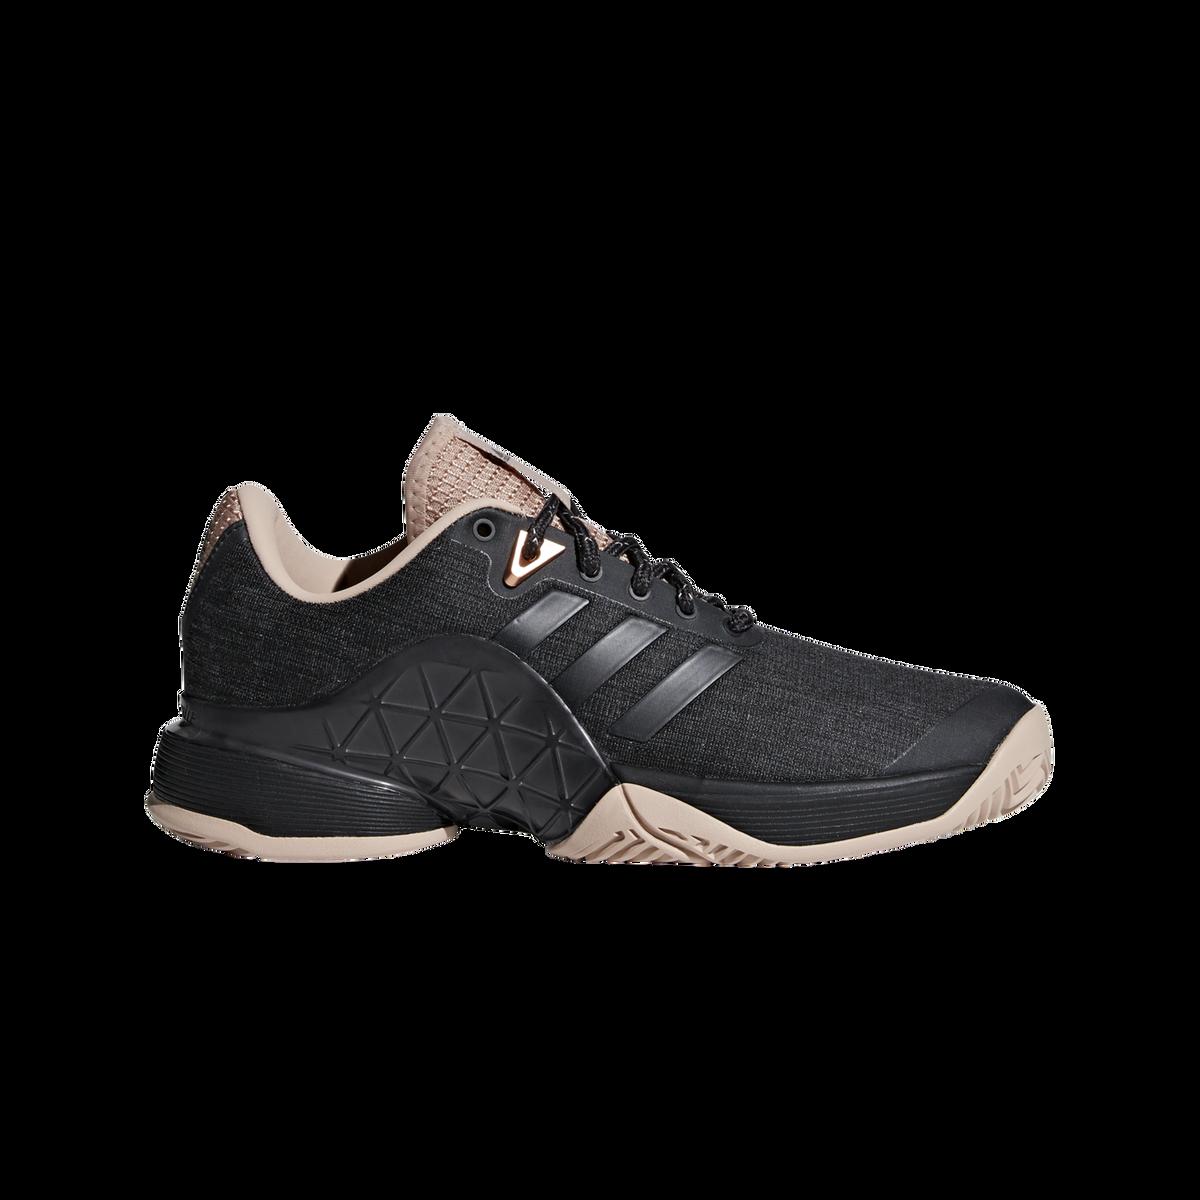 buy online 24004 7e7a0 Images. adidas Barricade 2018 ...